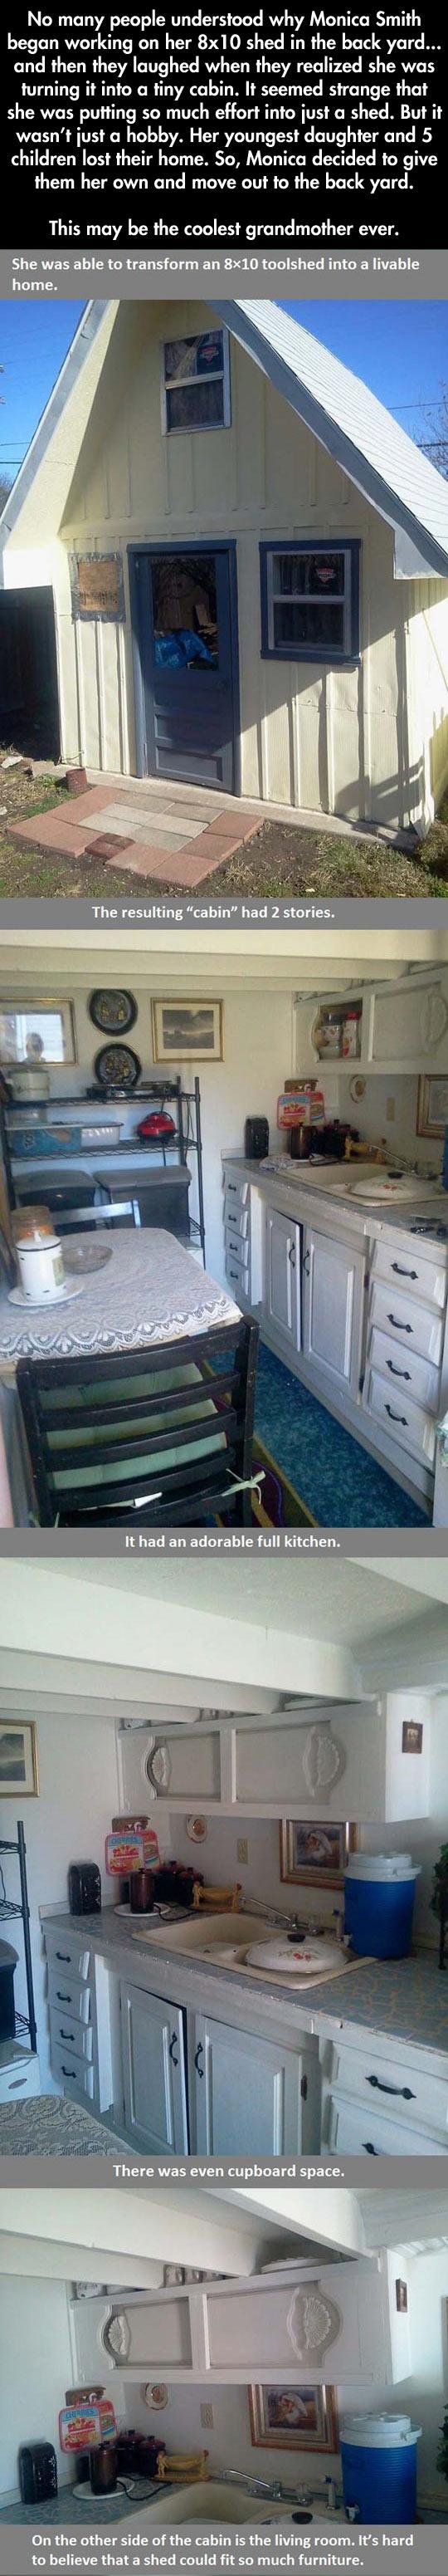 funny-shed-cabin-back-yard-grandmother